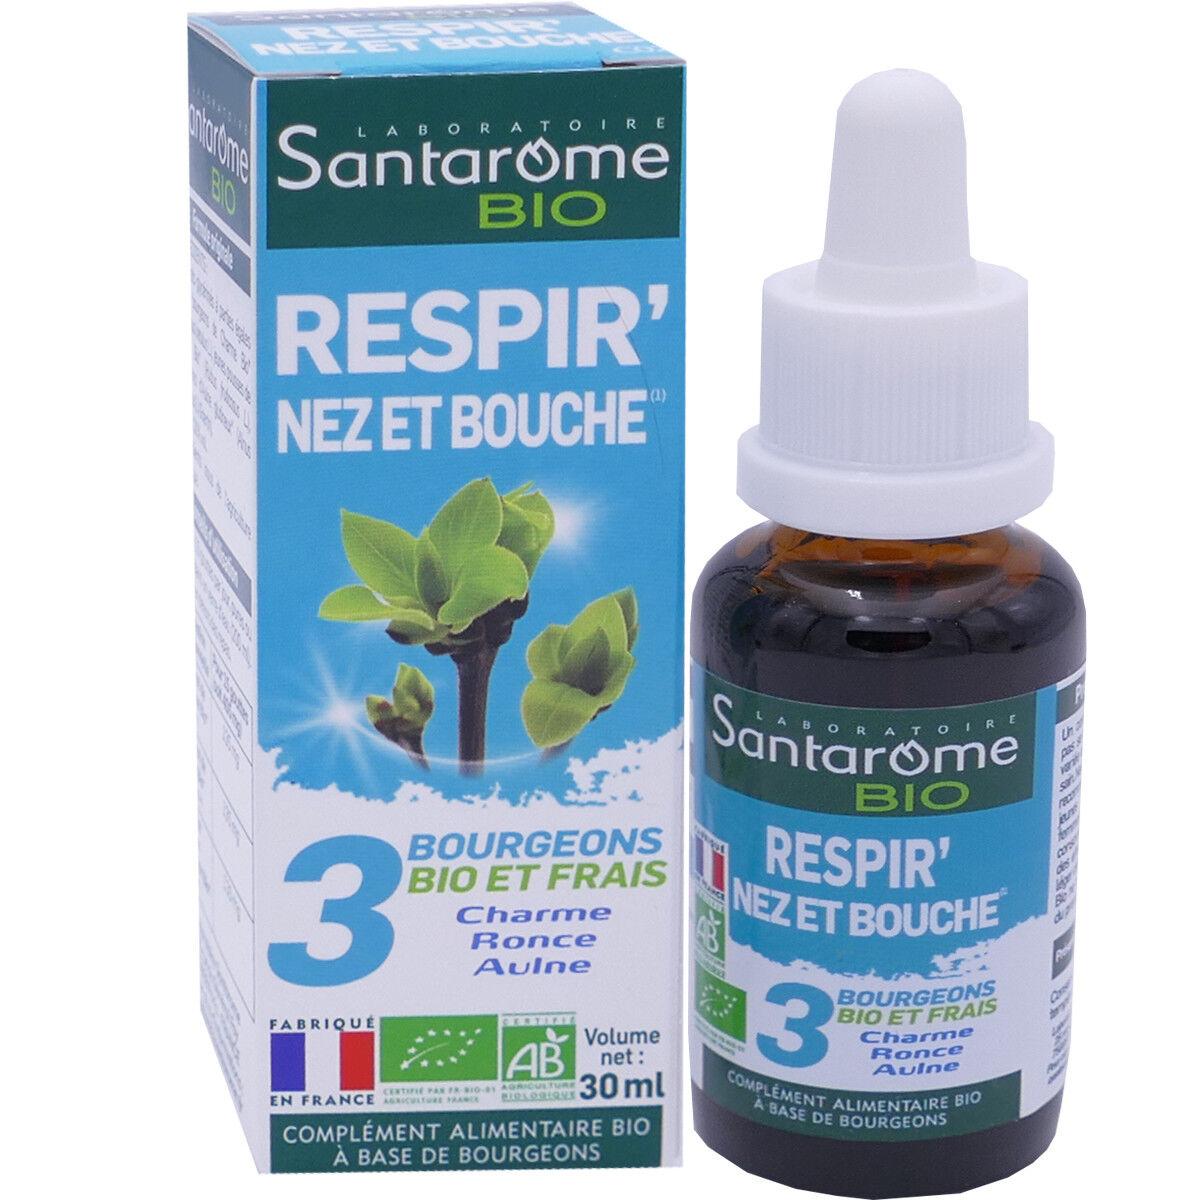 Santarome bio respir' nez bouche 30 ml